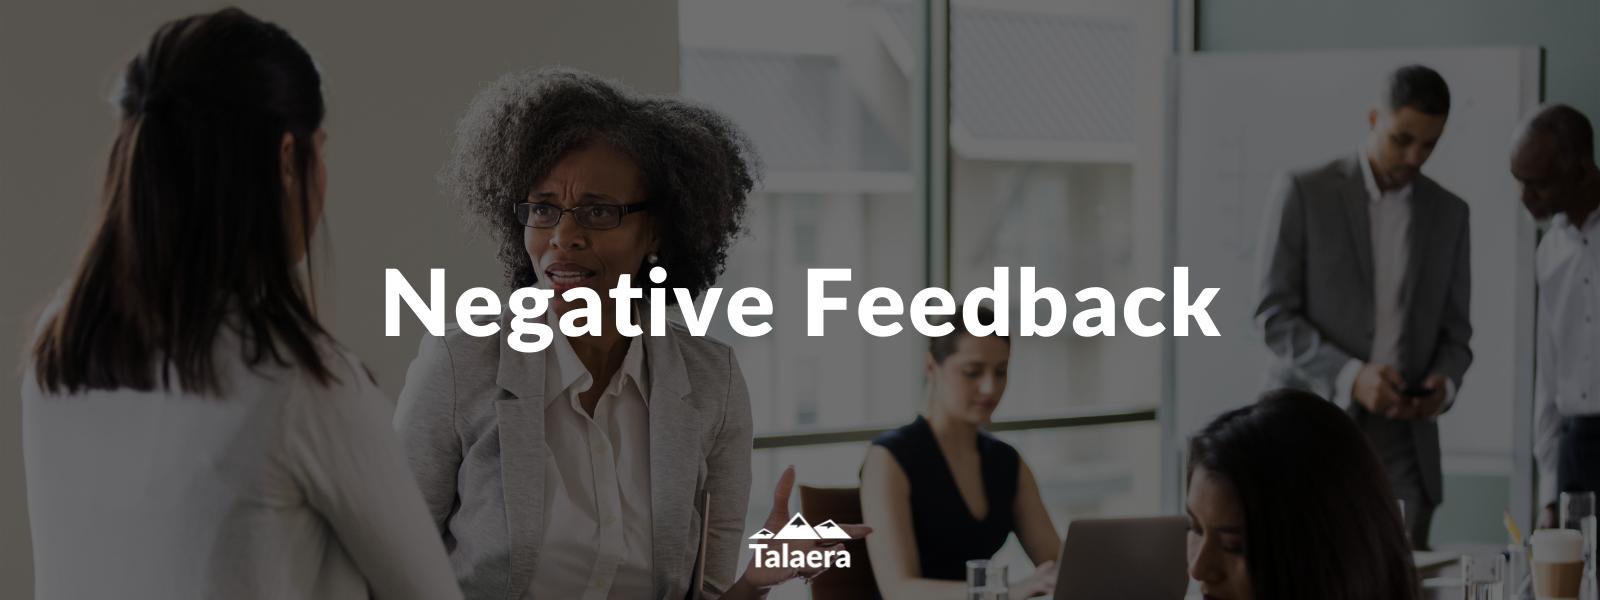 Negative Feedback - Talaera Blog.png